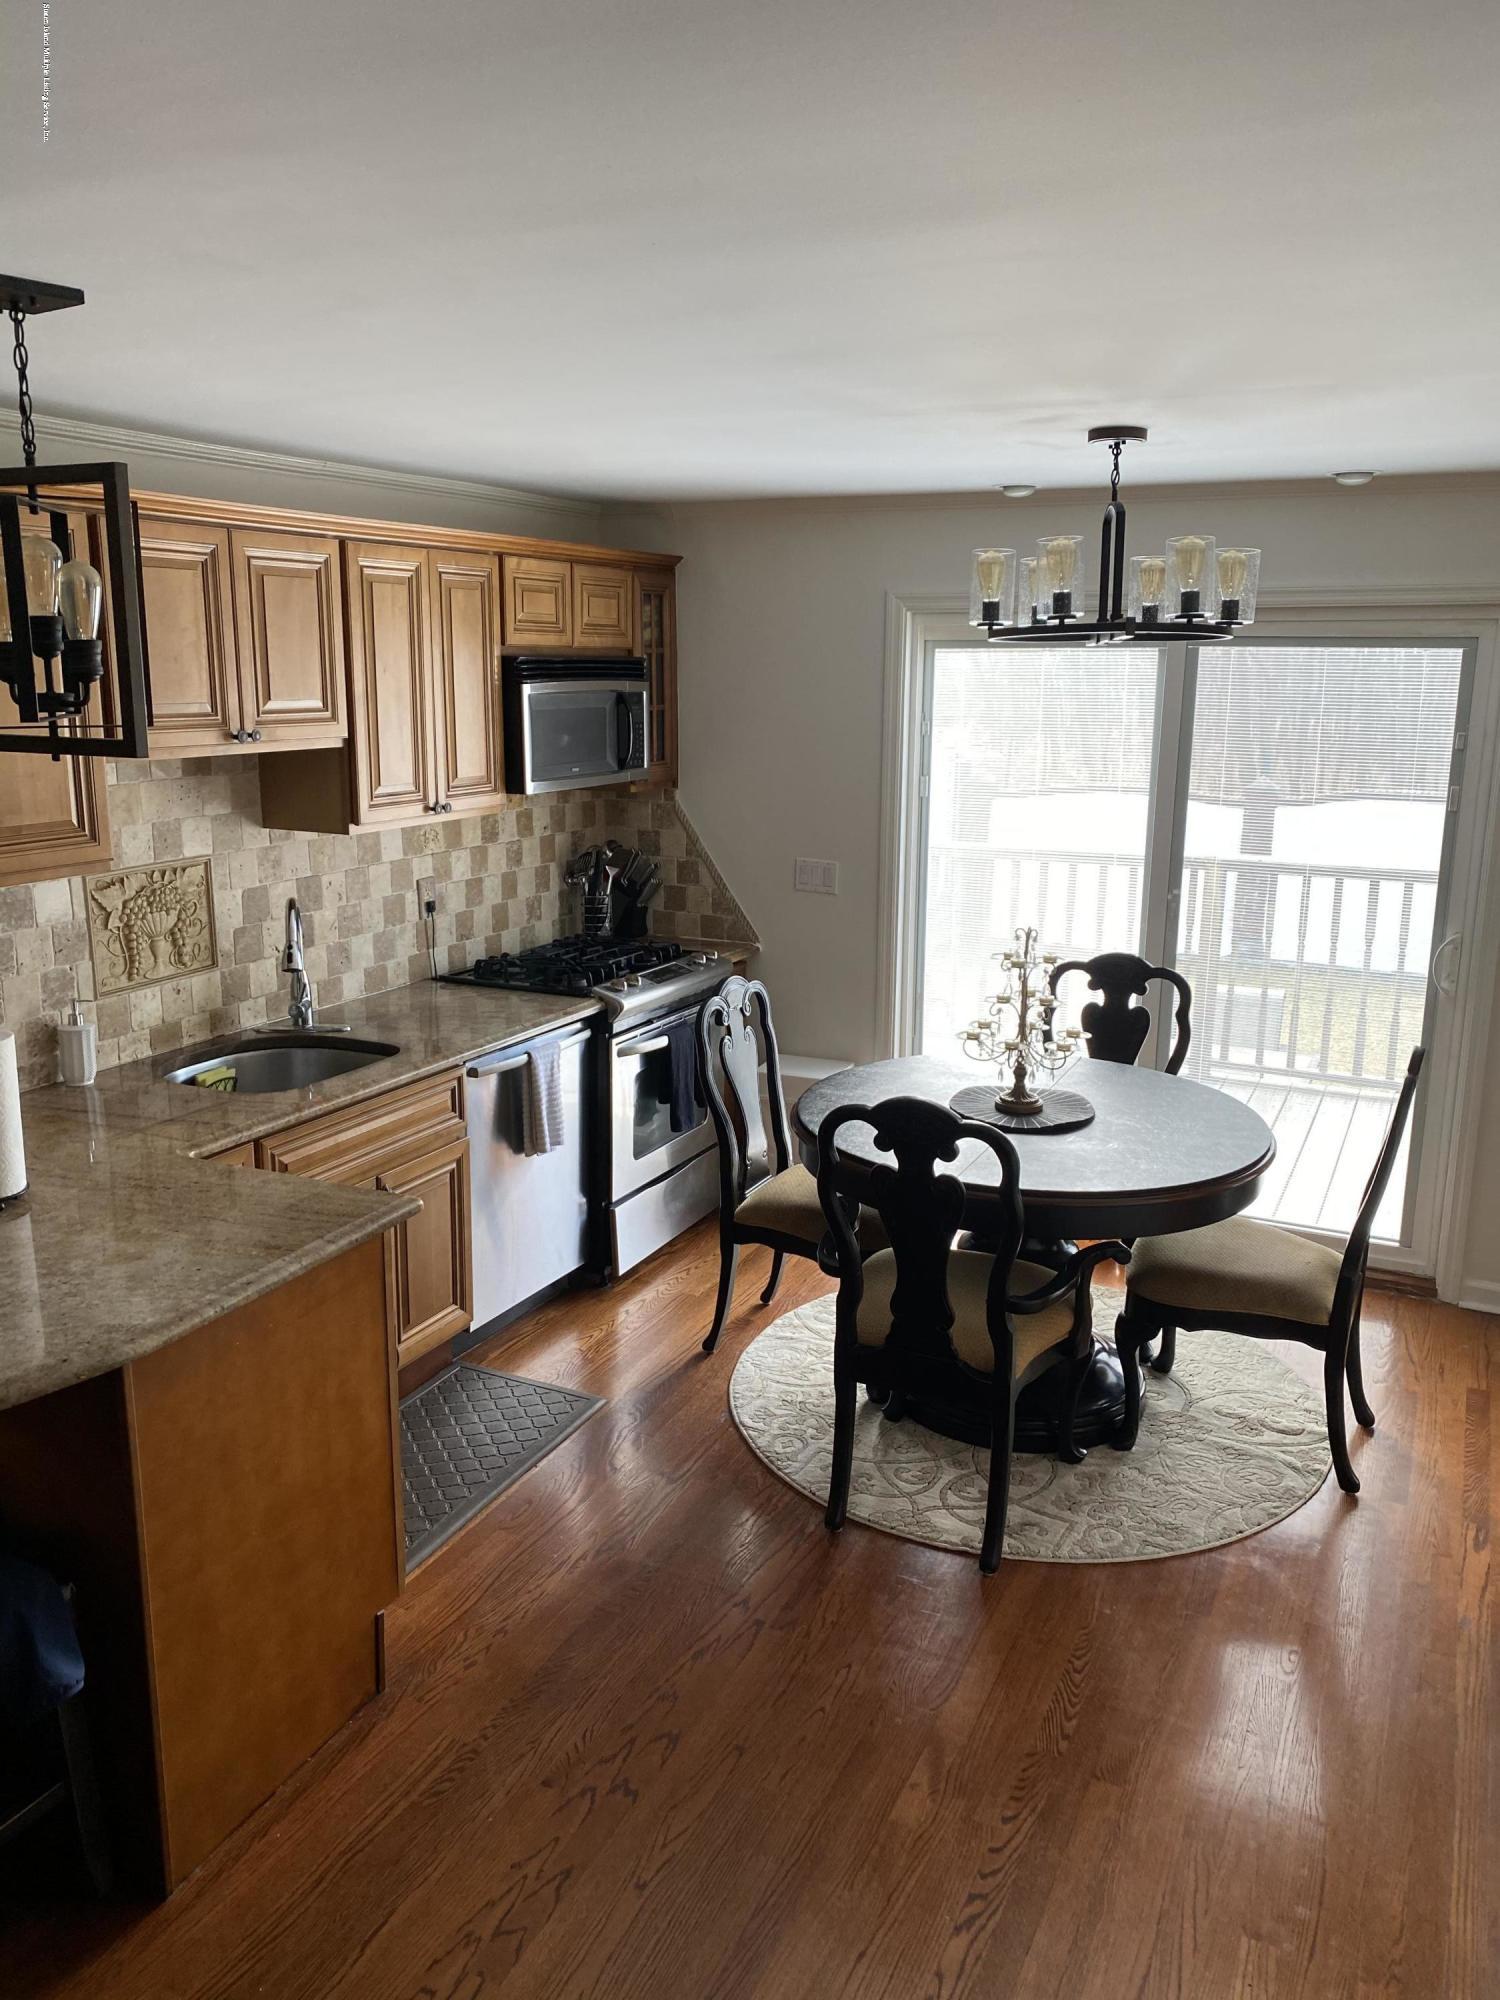 Single Family - Semi-Attached 370 Seaver Avenue  Staten Island, NY 10305, MLS-1136339-22